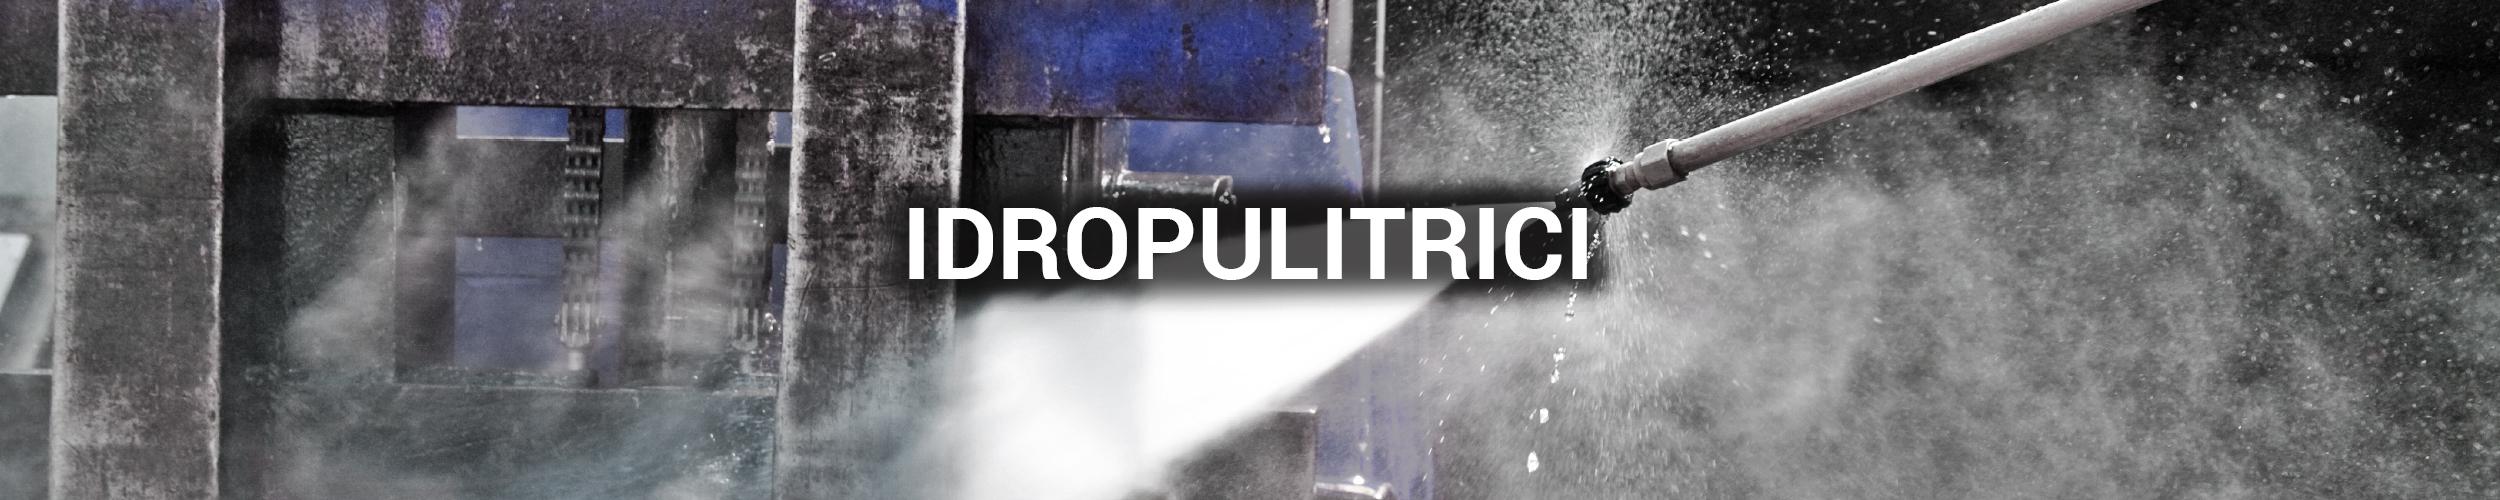 IDROPULITRICI+pulizia+industriale+e+professionale+biemmedue+cherasco+cuneo+torino+piemonte.jpeg